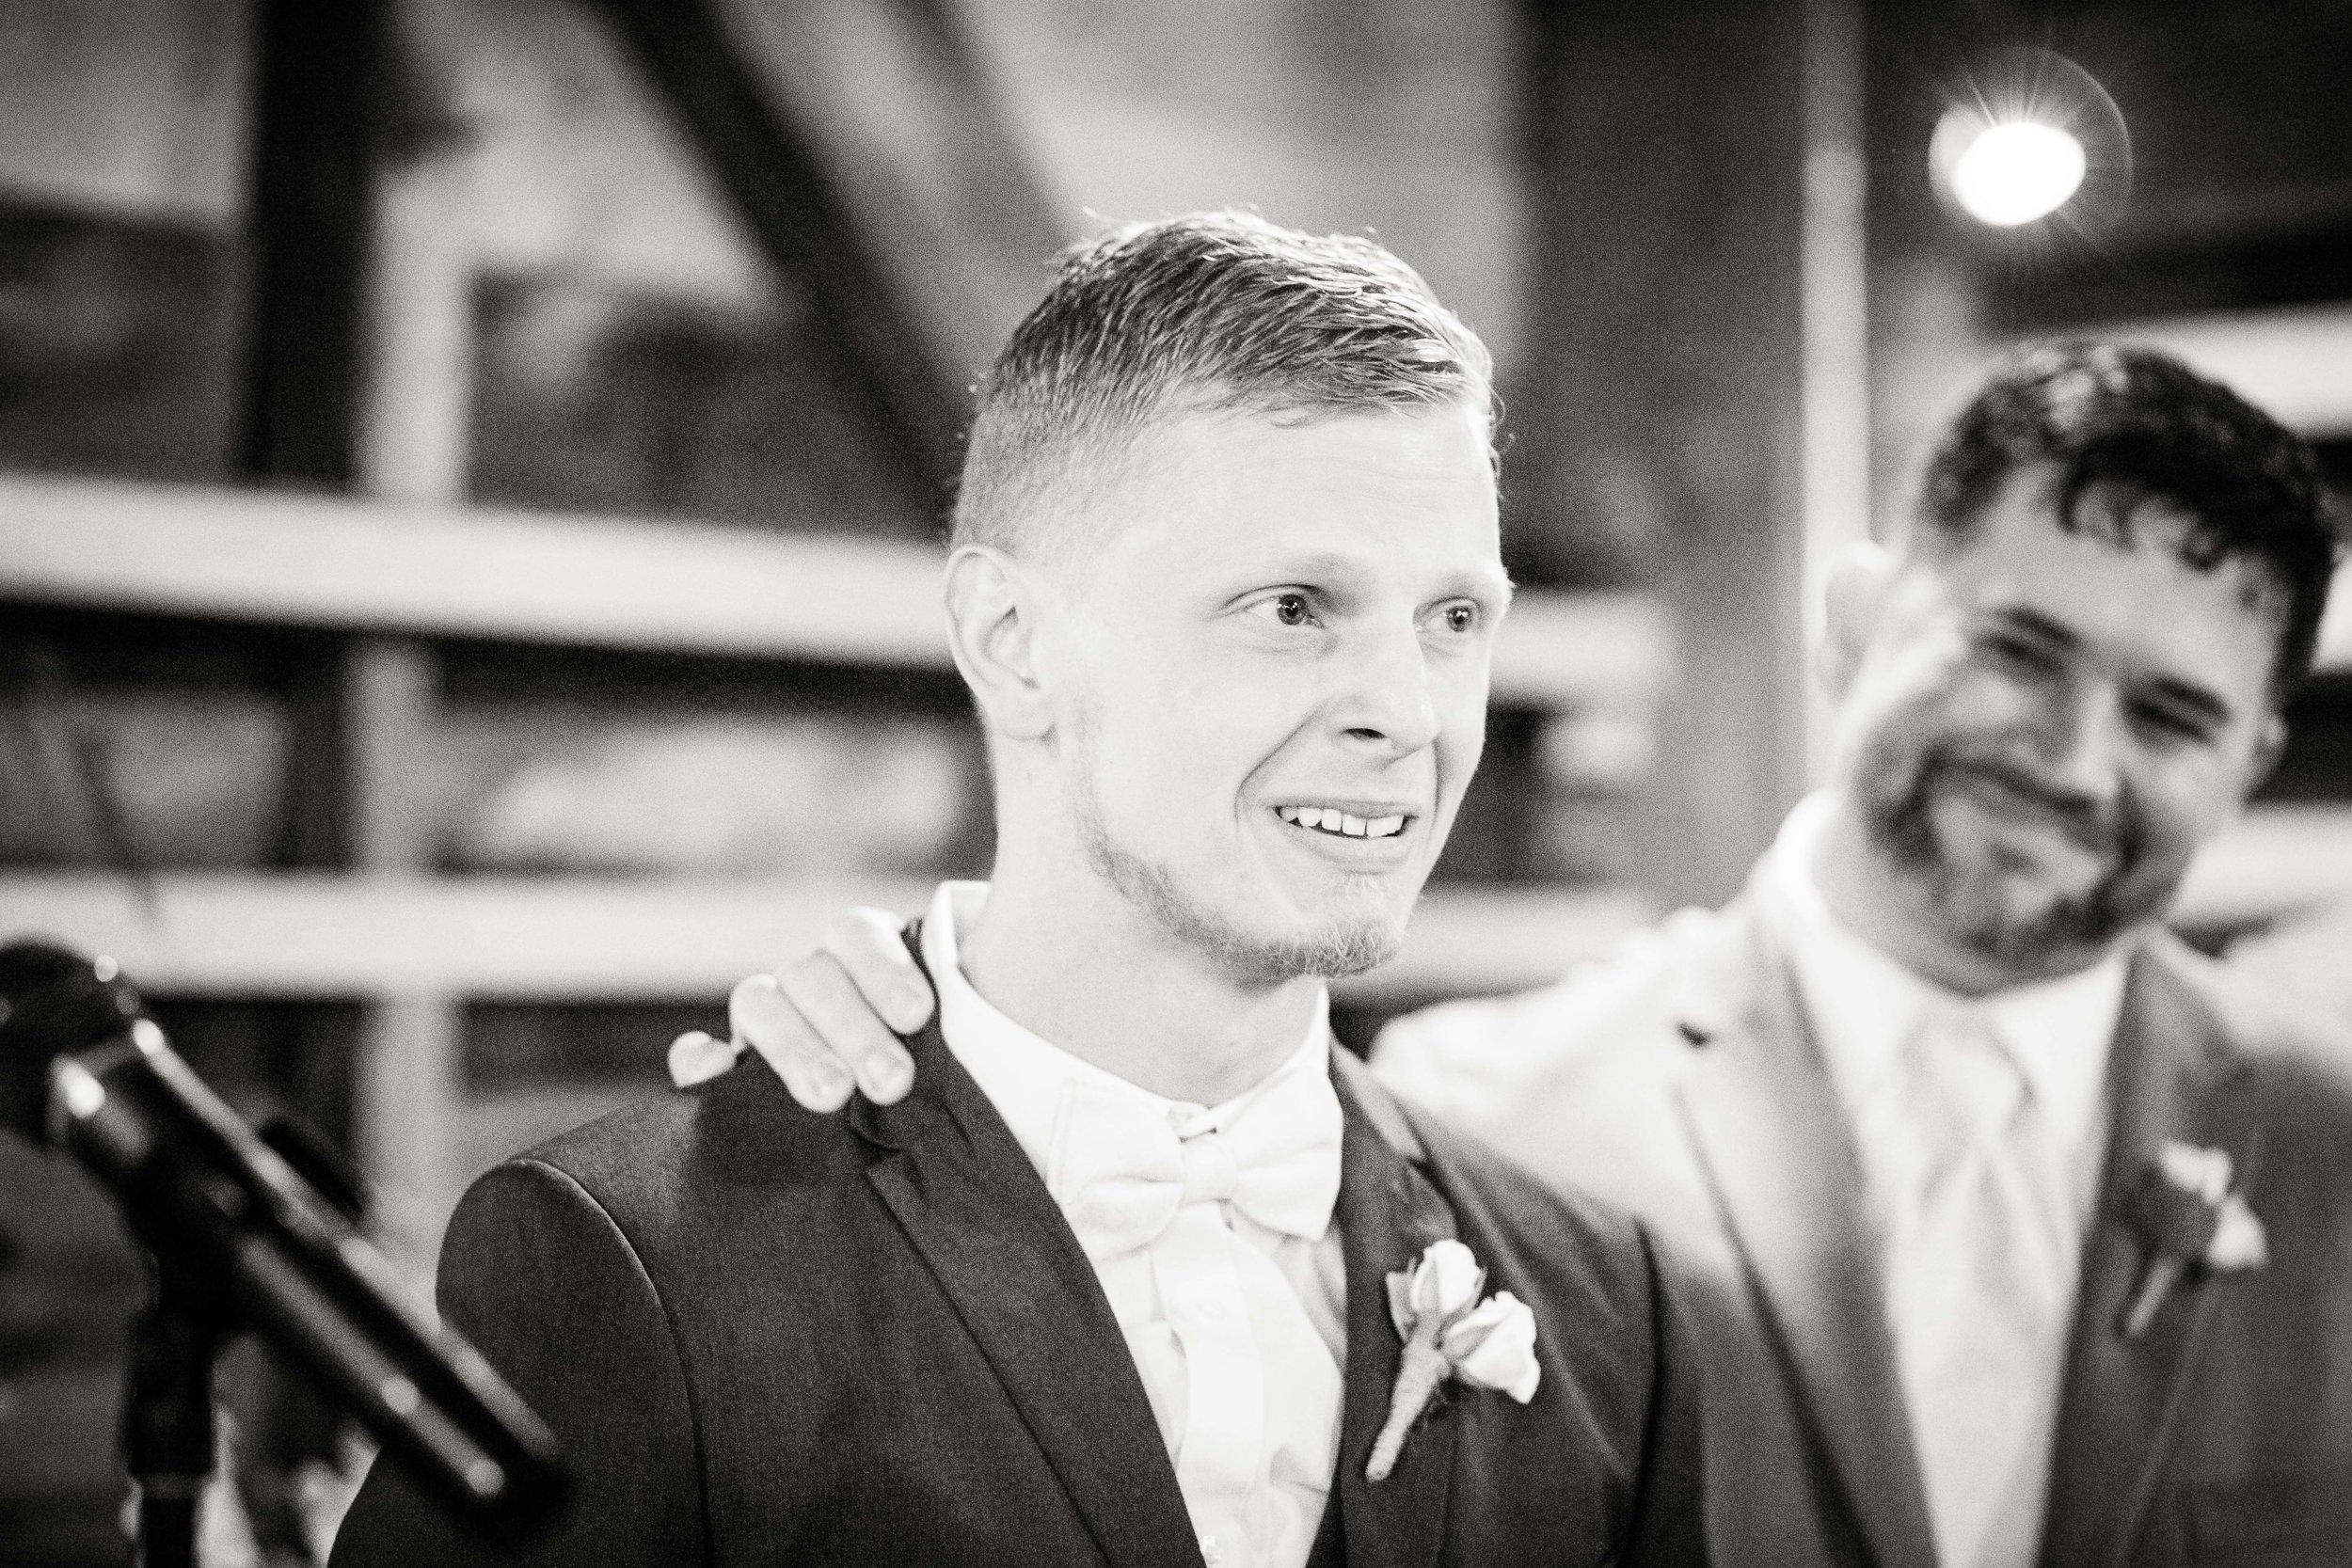 PRALLISVILLE MILLS NEW HOPE WEDDING PHOTOGRAPHY-55.jpg